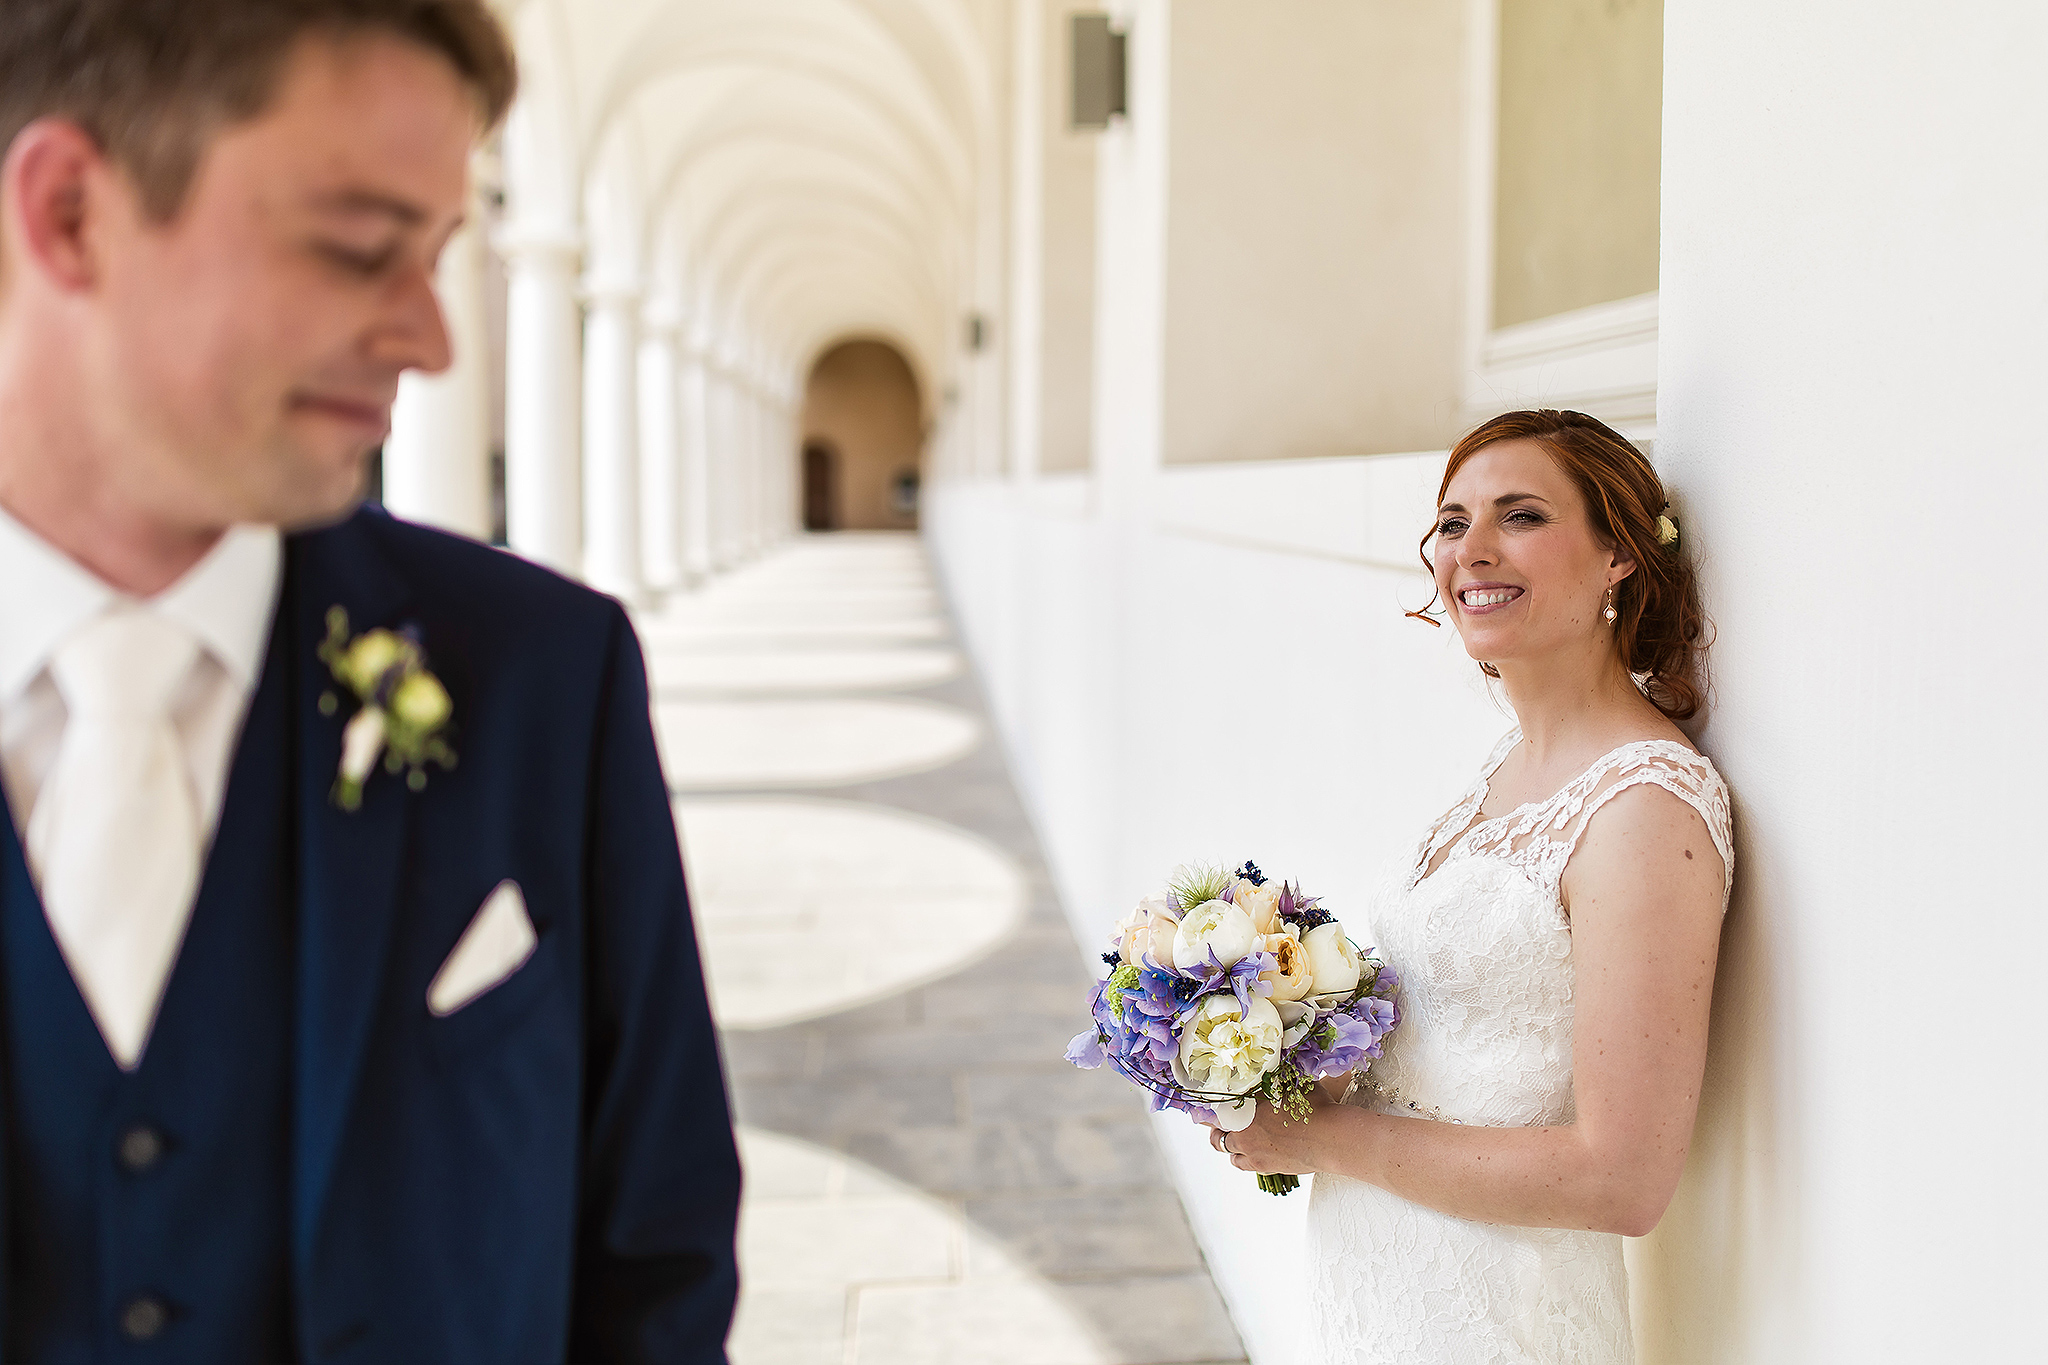 Evangelisch heiraten obwohl geschieden